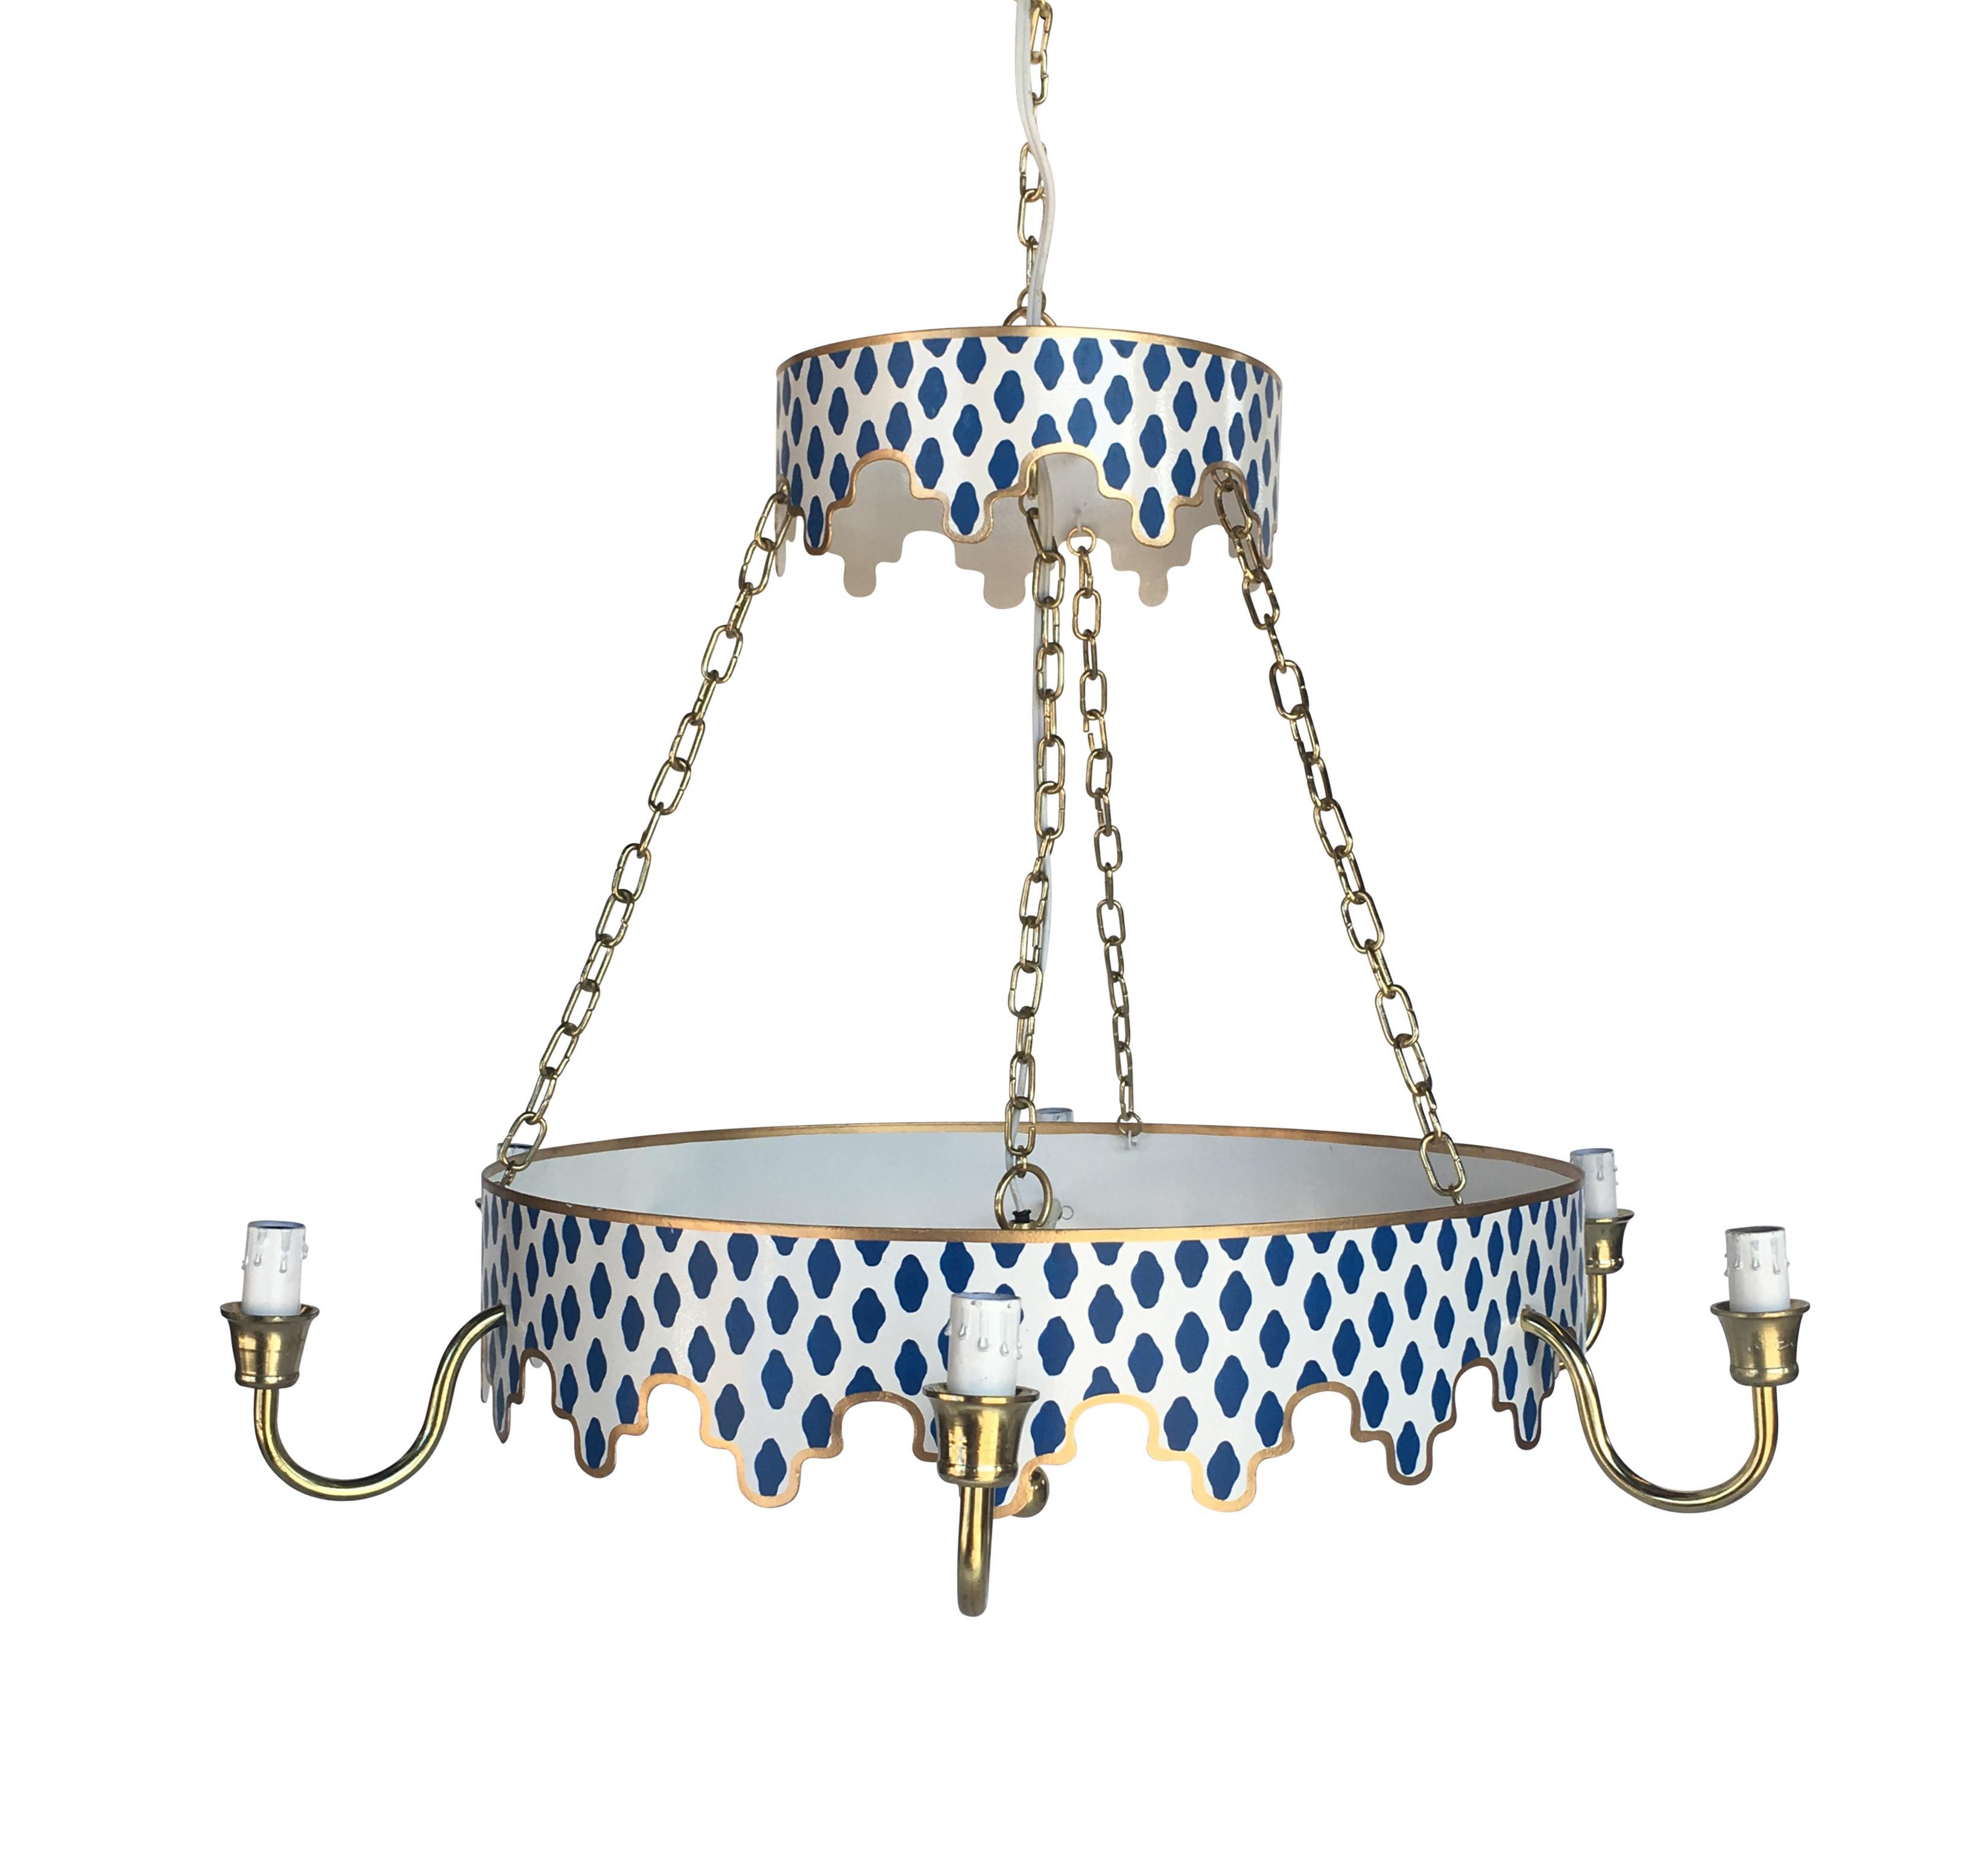 Dana gibson navy parsi metal chandelier chairish arubaitofo Images